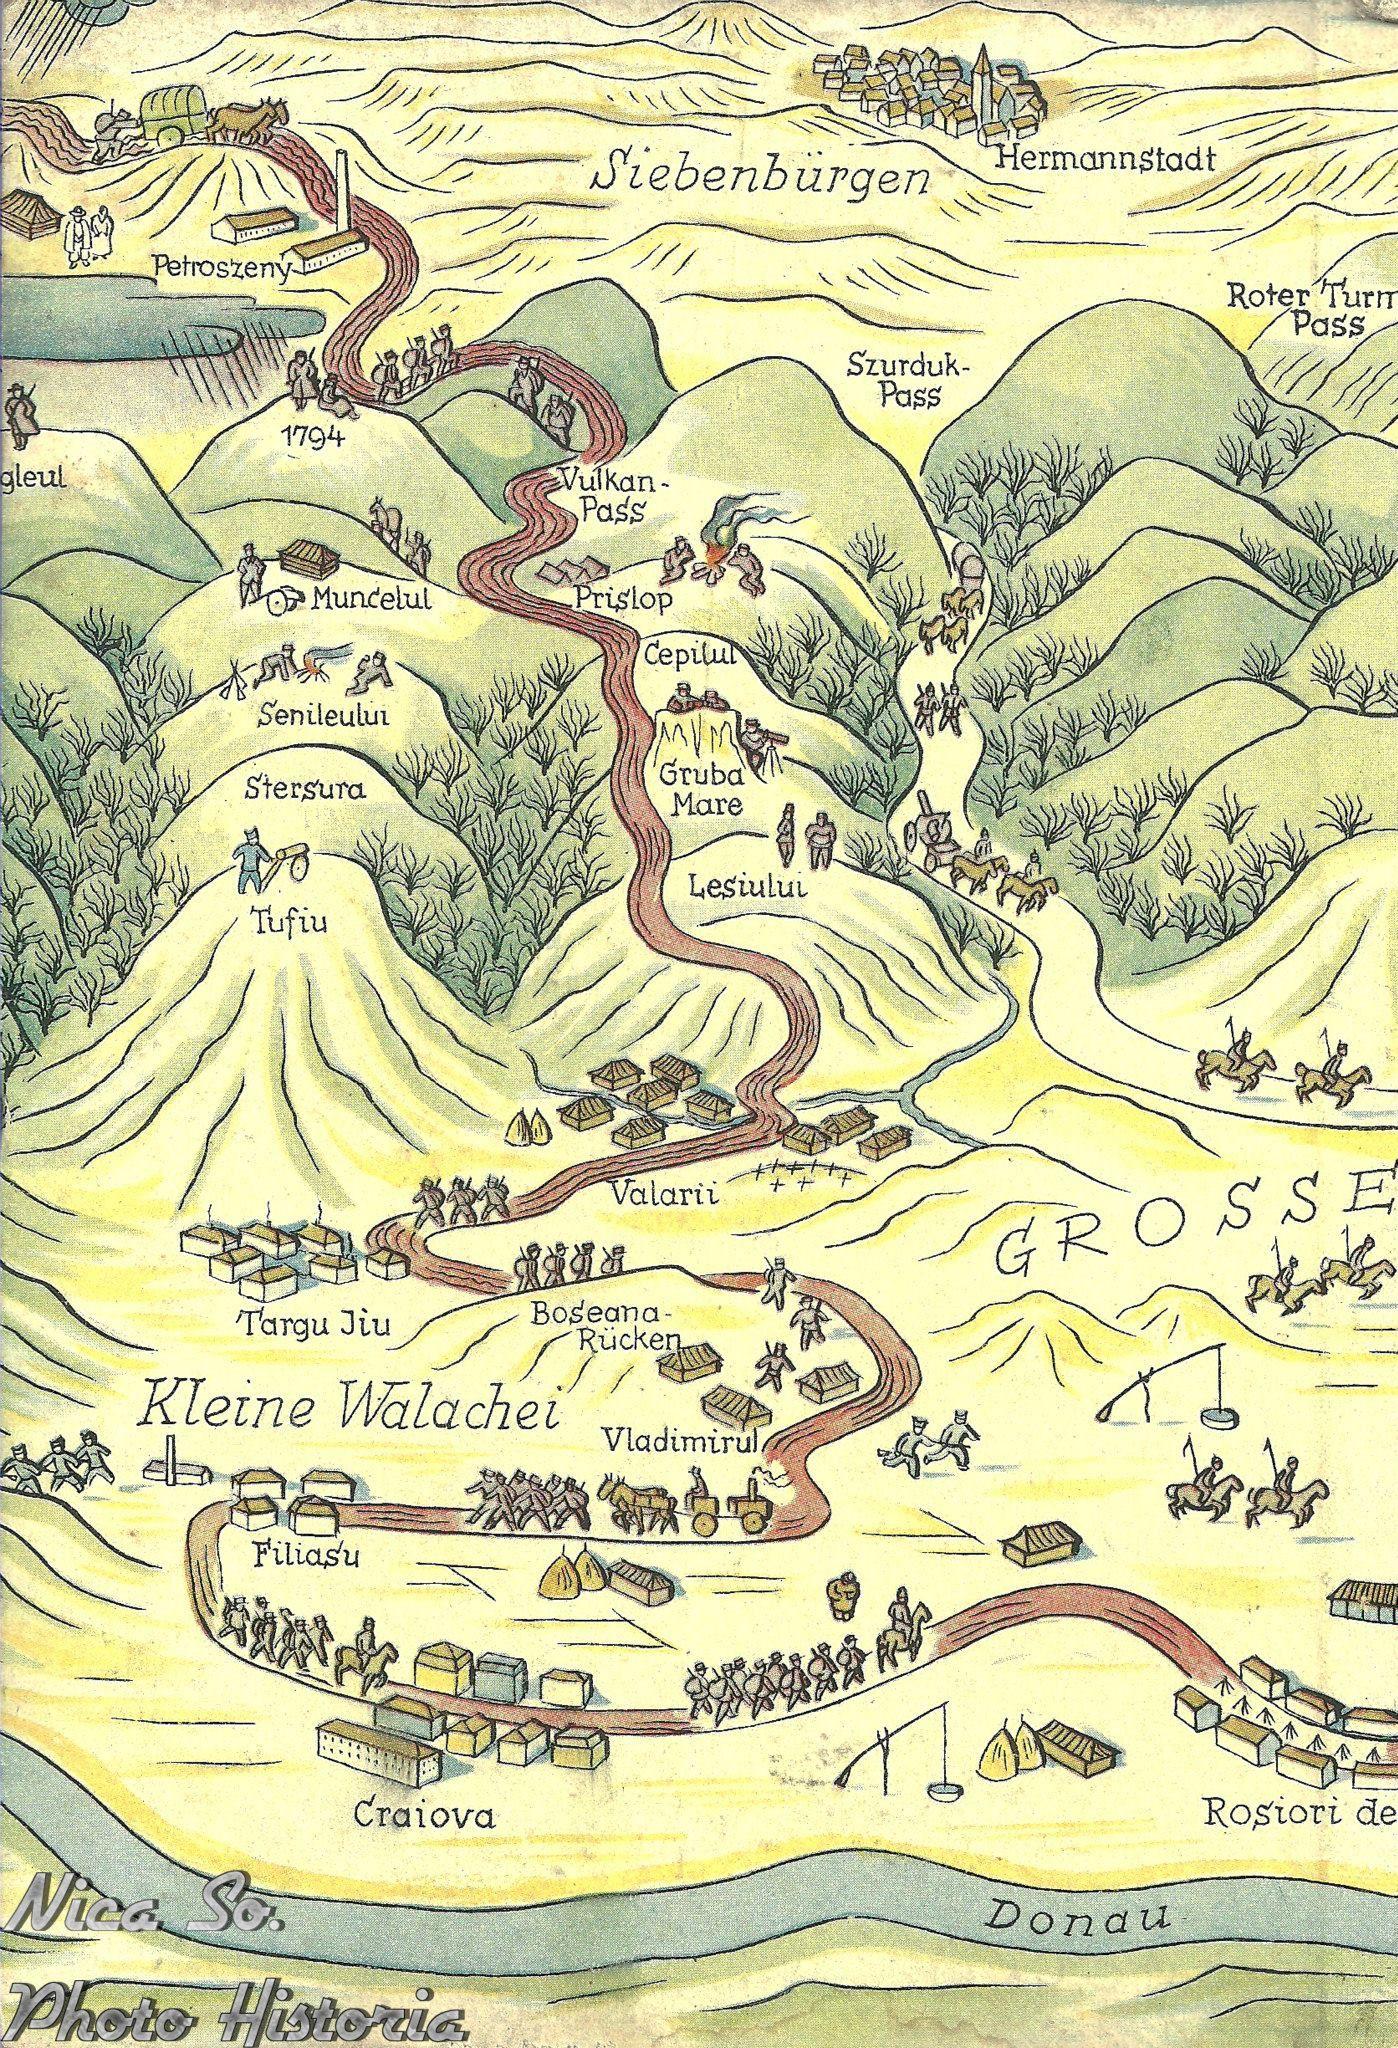 Craiova Targu Jiu Old Maps Pinterest